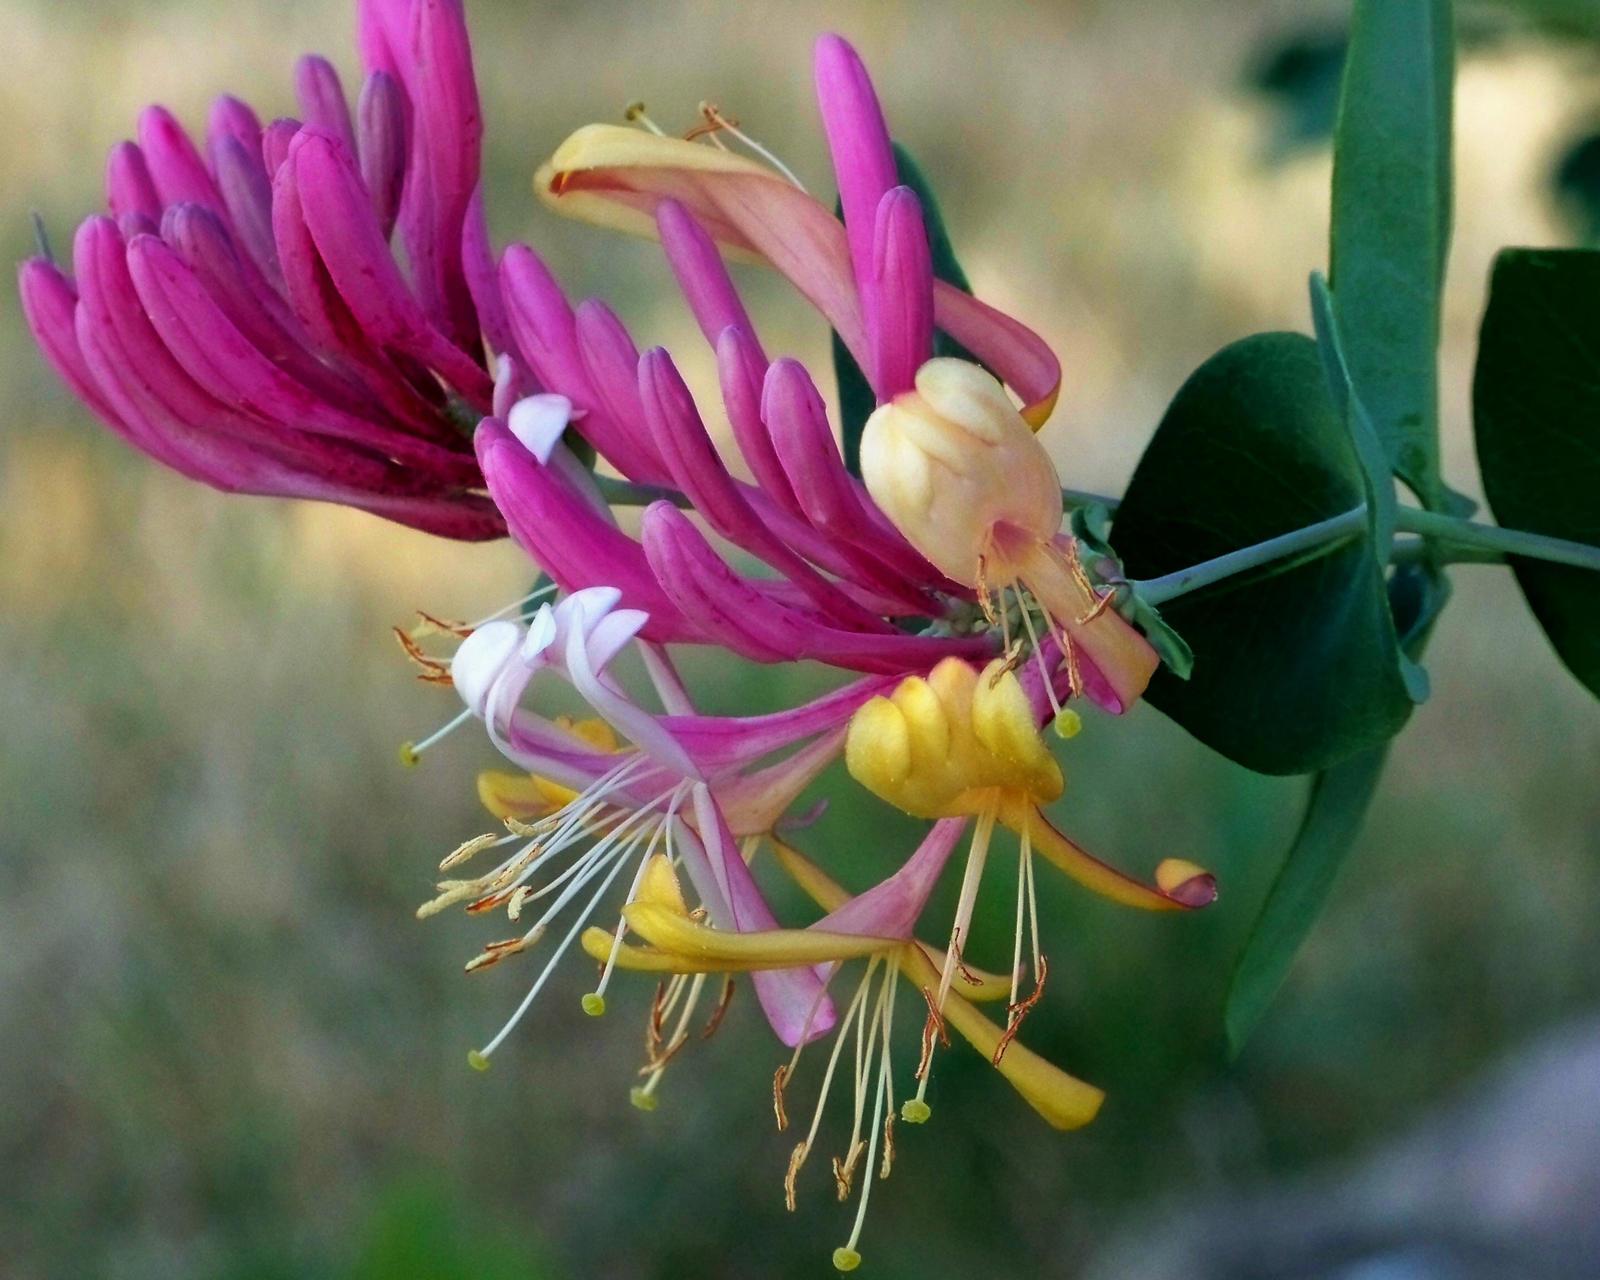 Honeysuckle Flowers III by MadGardens on DeviantArt